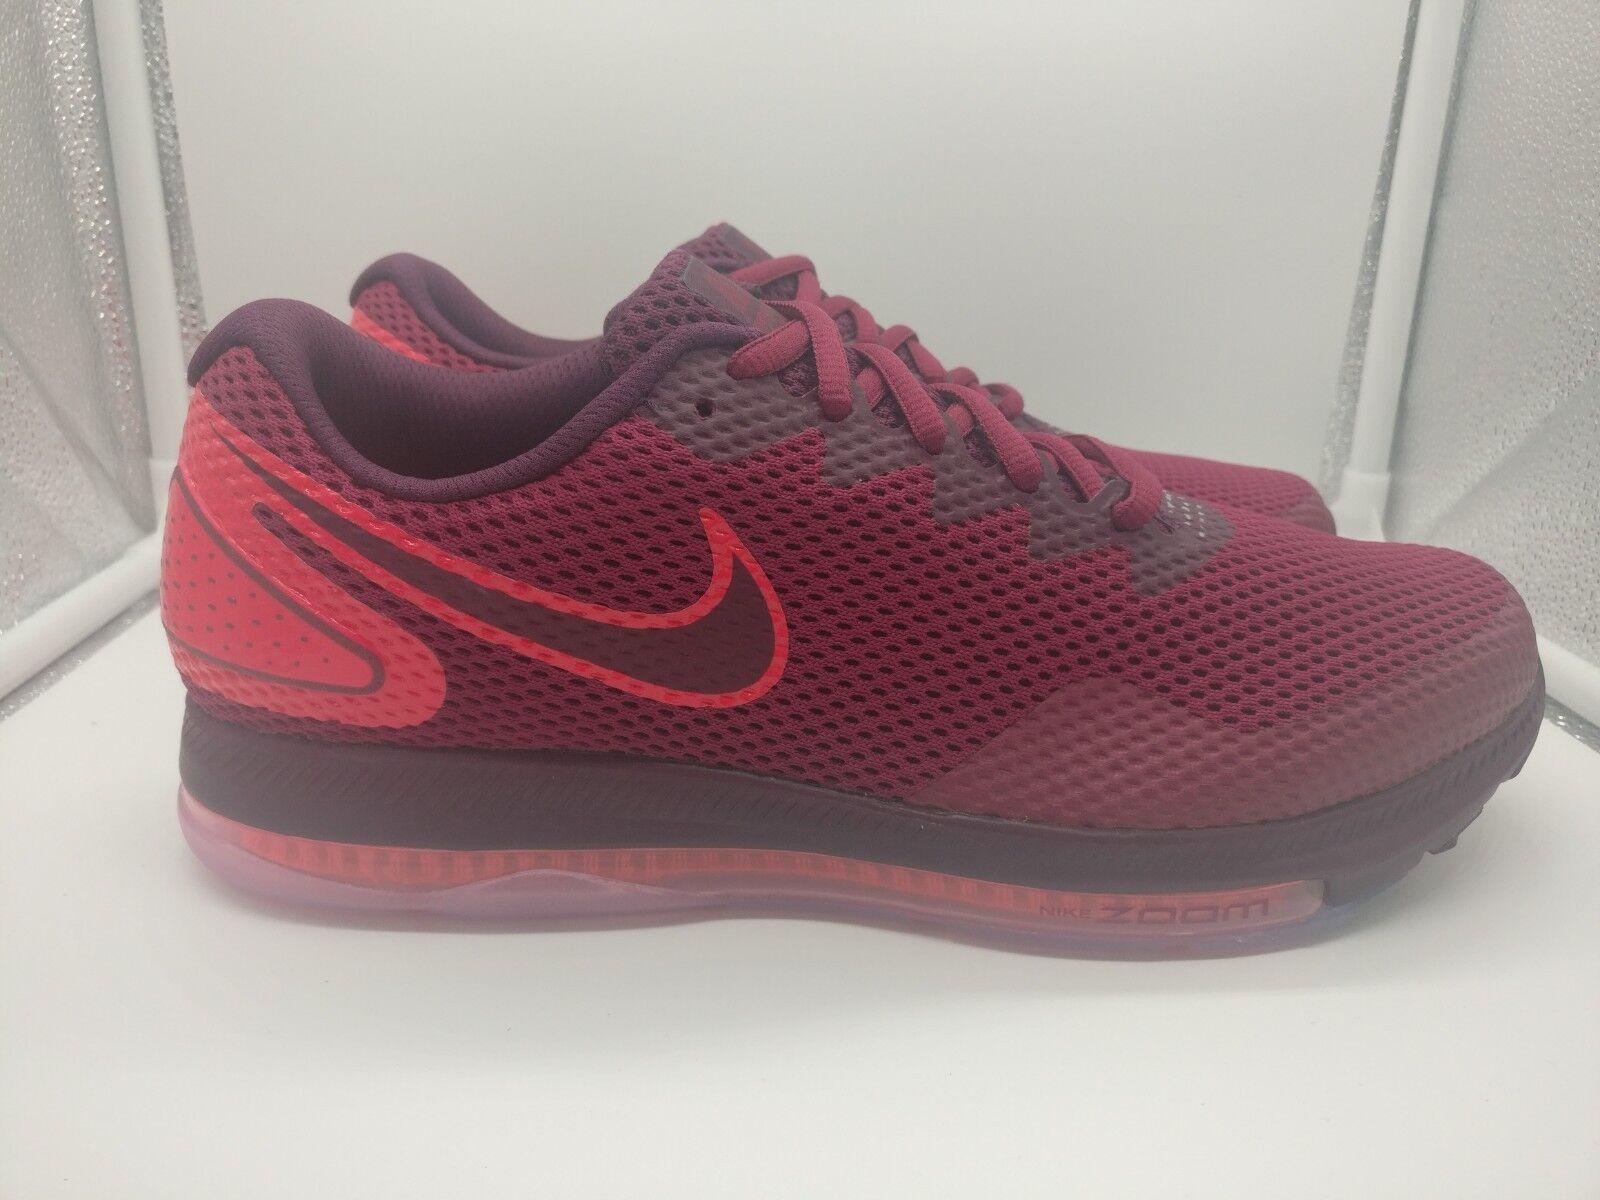 Nike Damenschuhe Zoom All Out Niedrig 2 2 2 UK 8 Rush Maroon Blush AJ0036-600 a917ea